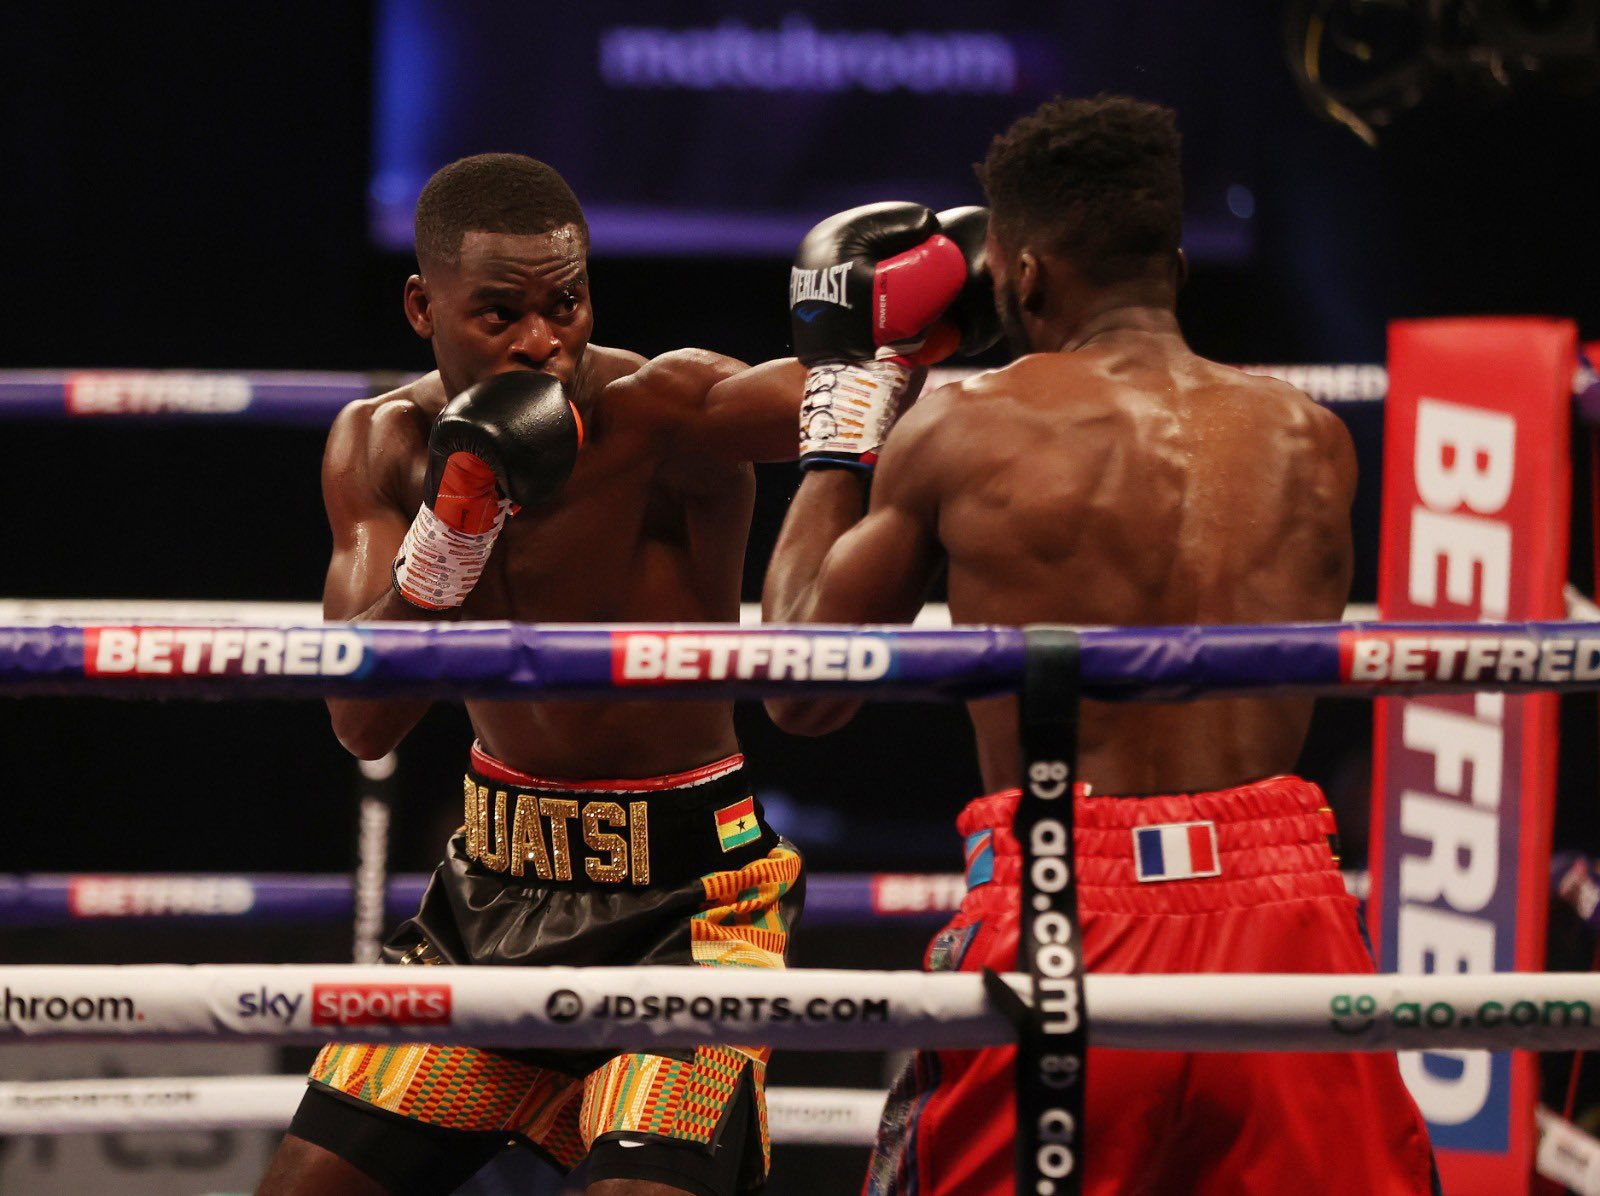 Joshua Buatsi retained his WBA-International belt with an impressive KO against Dos Santos